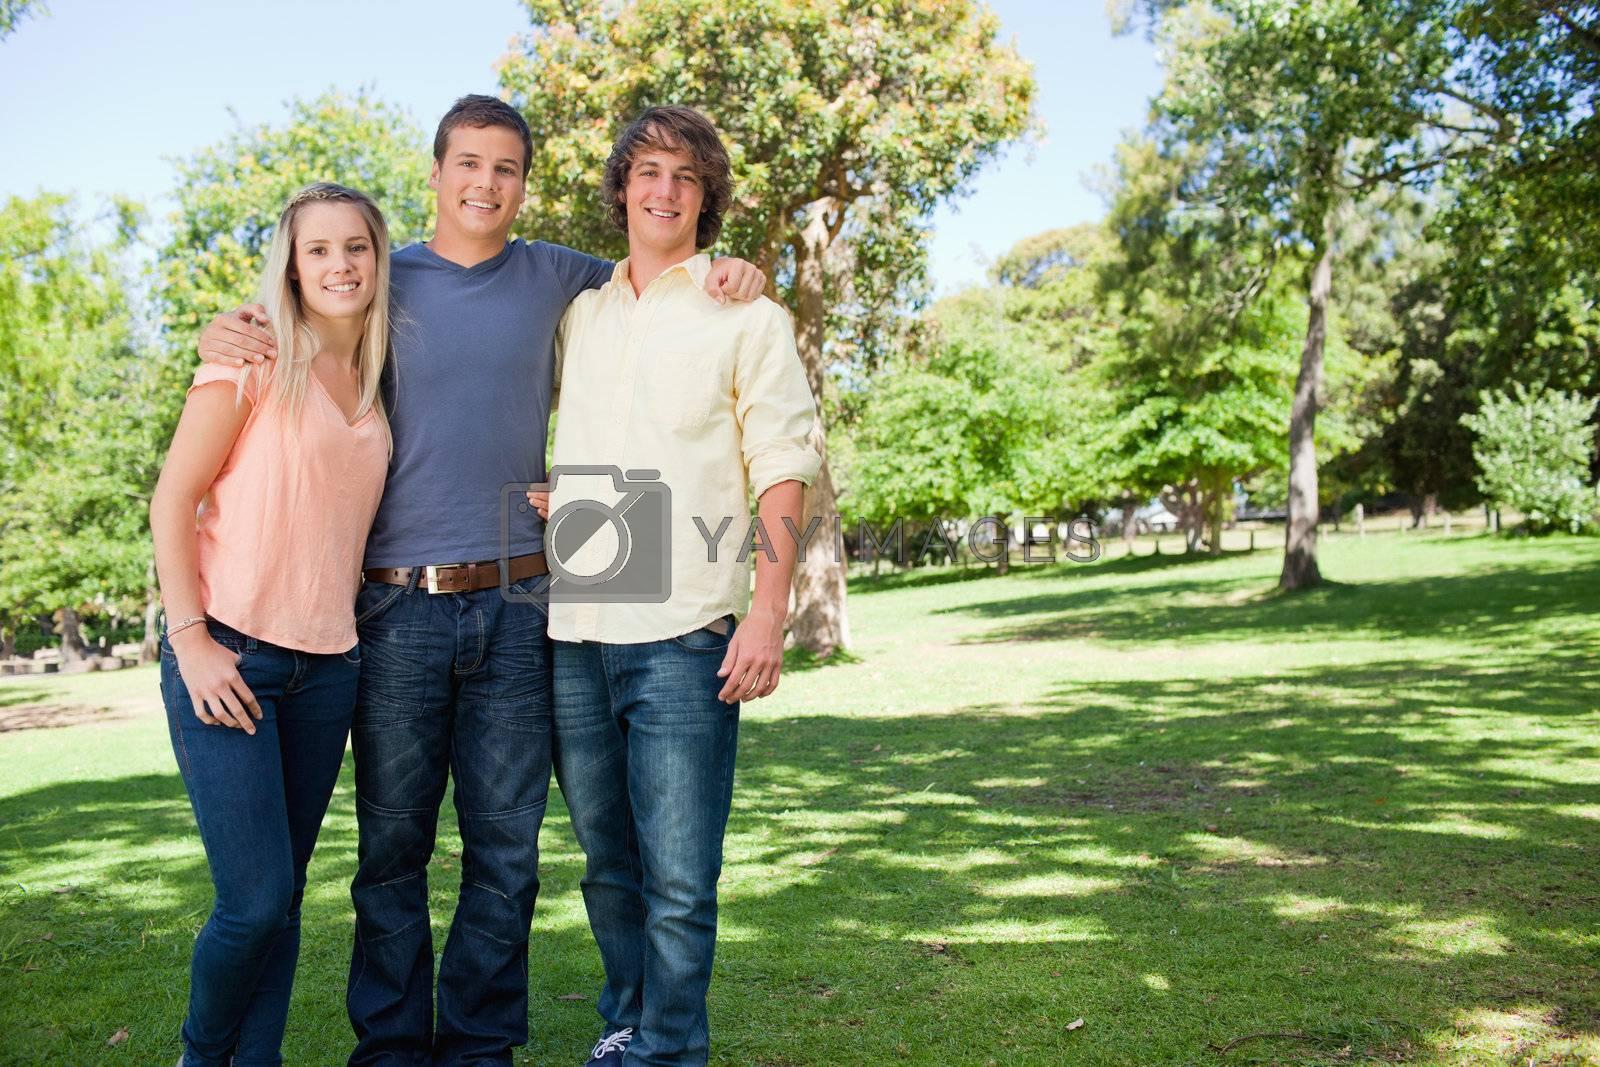 Portrait of three smiling students shoulder to shoulder in a park